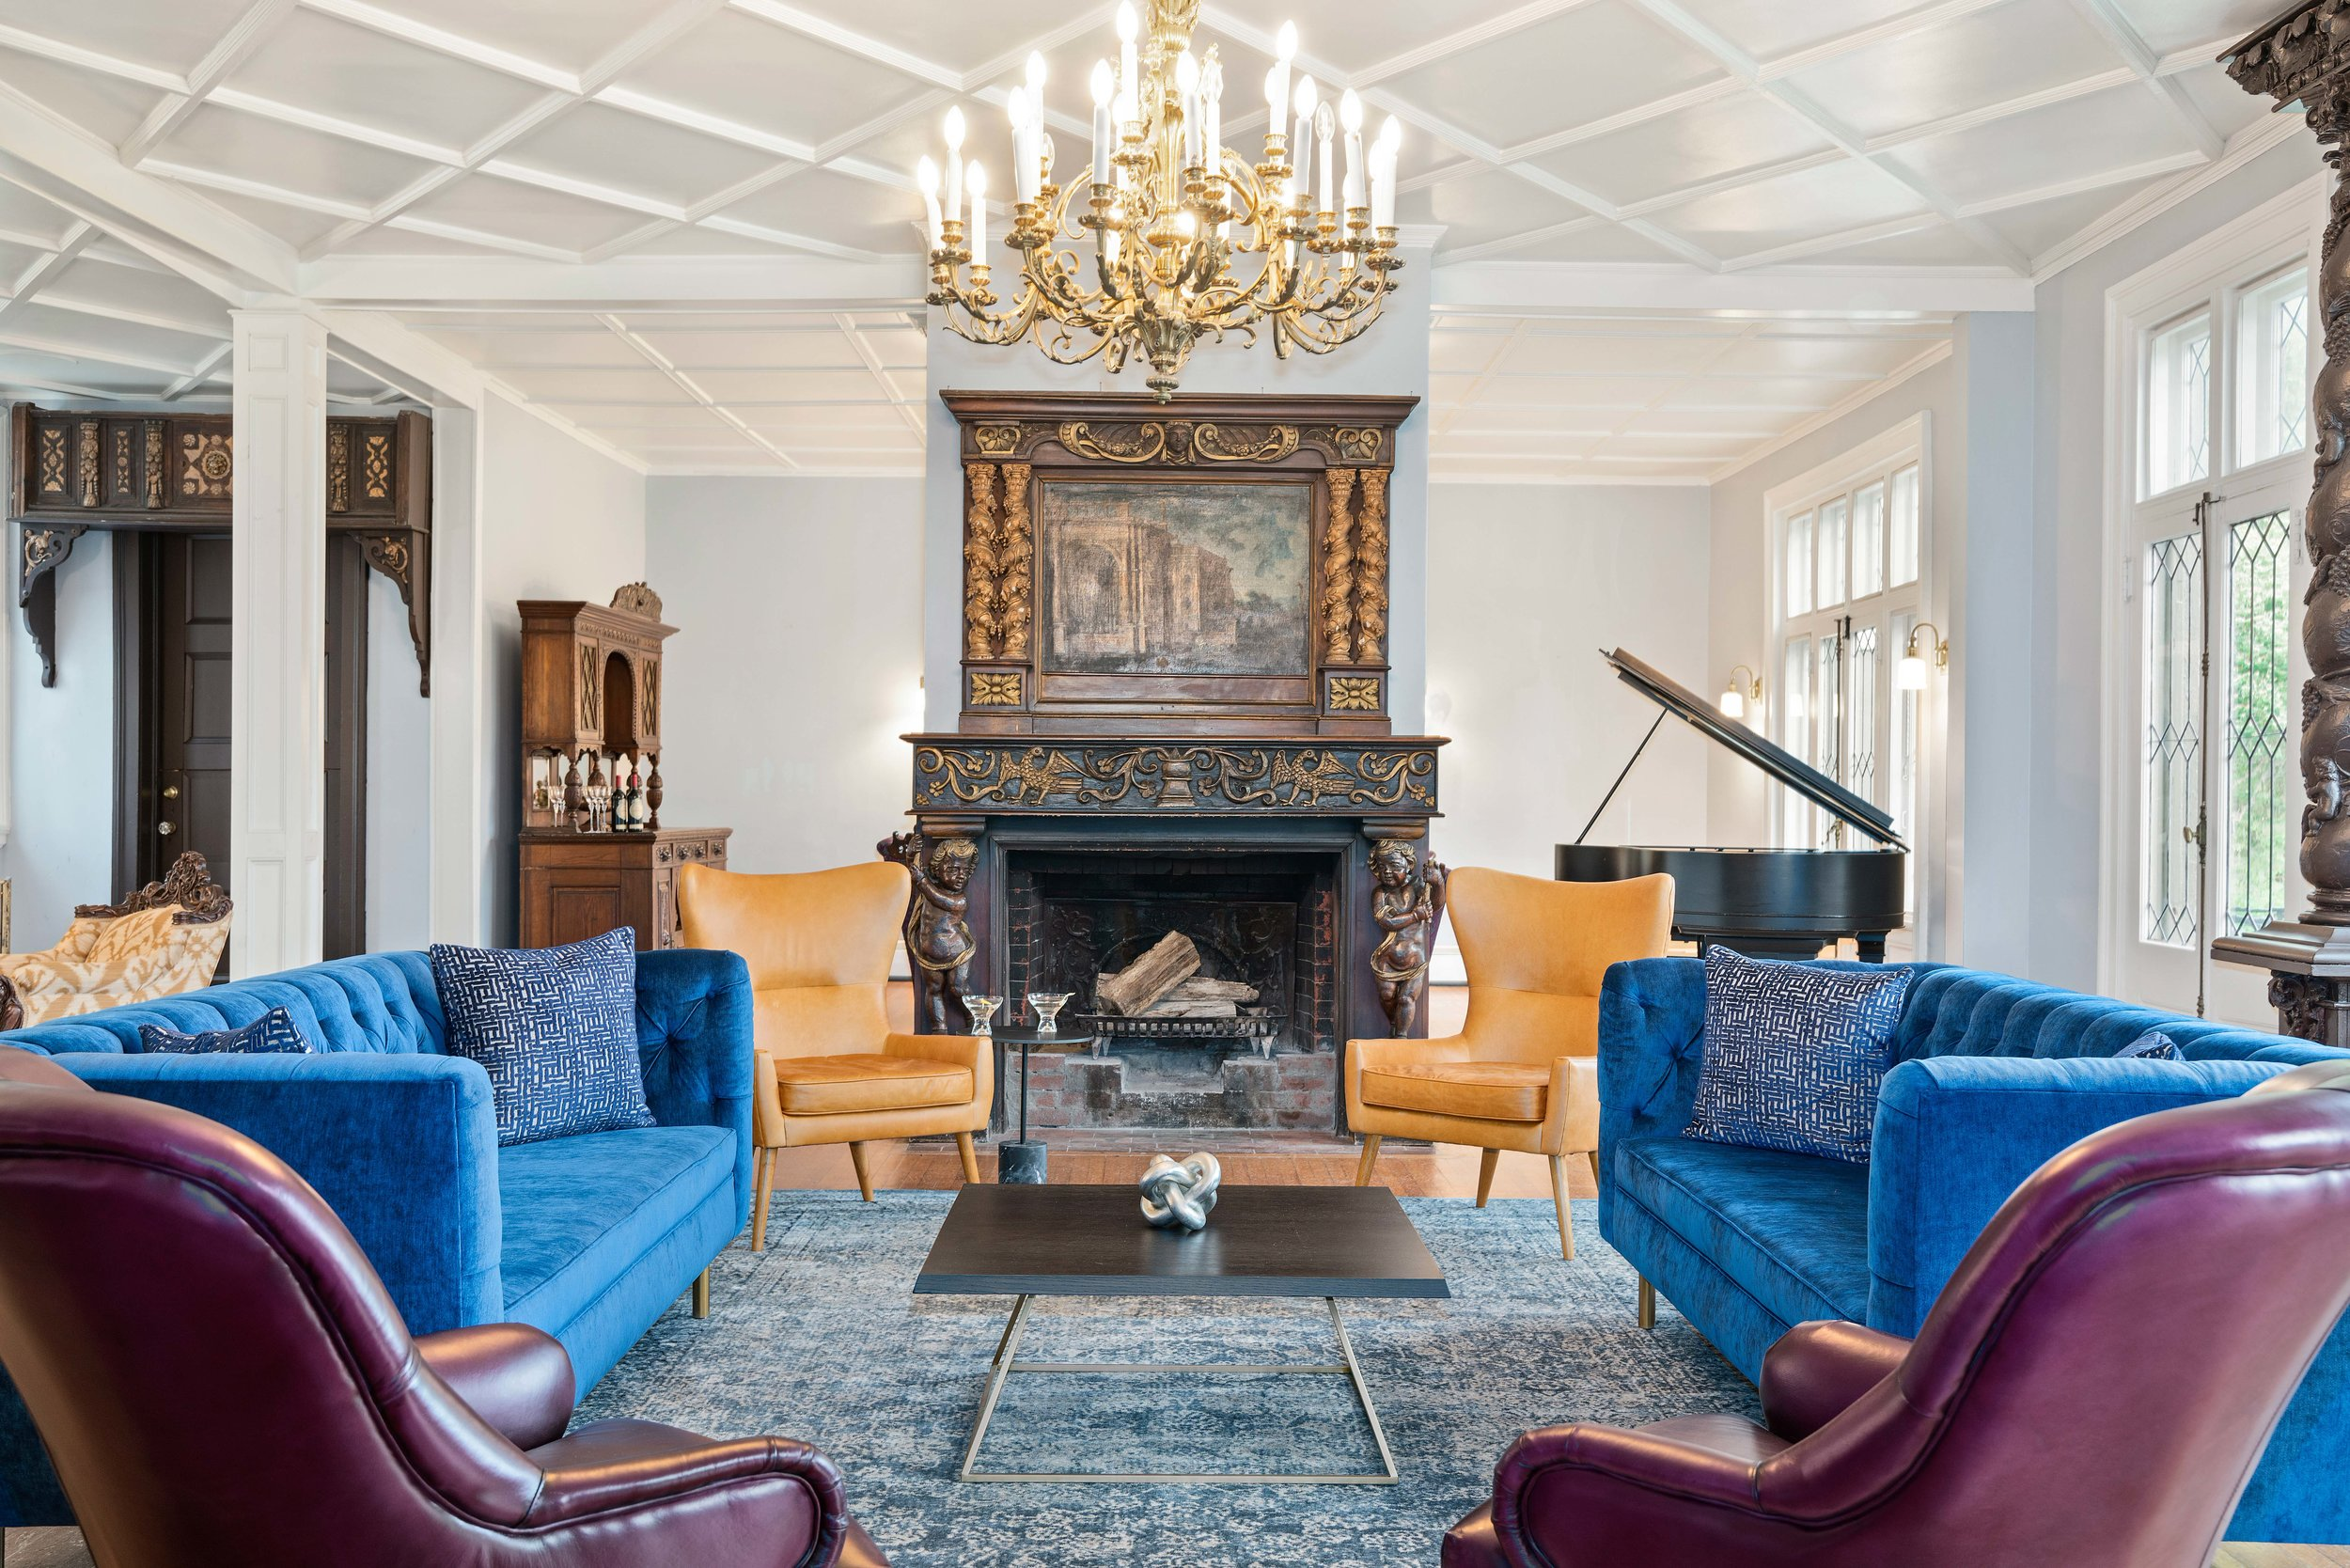 55.jpg Royal Blue and purple w fireplace parlor.jpg